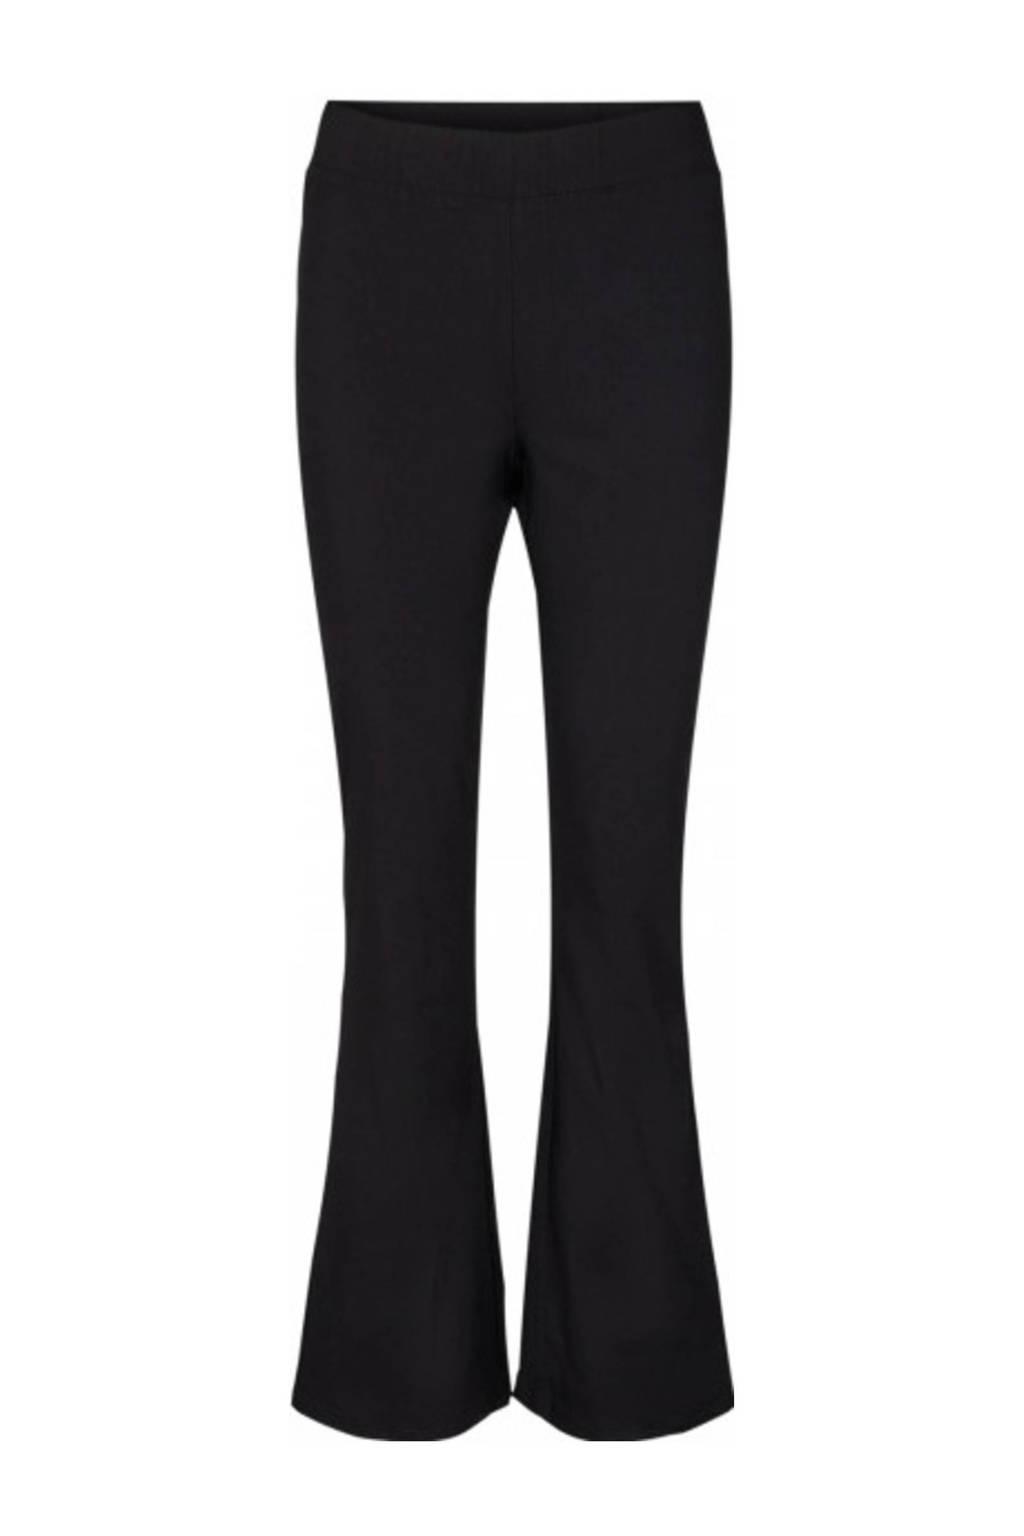 Soyaconcept flared broek zwart, Zwart